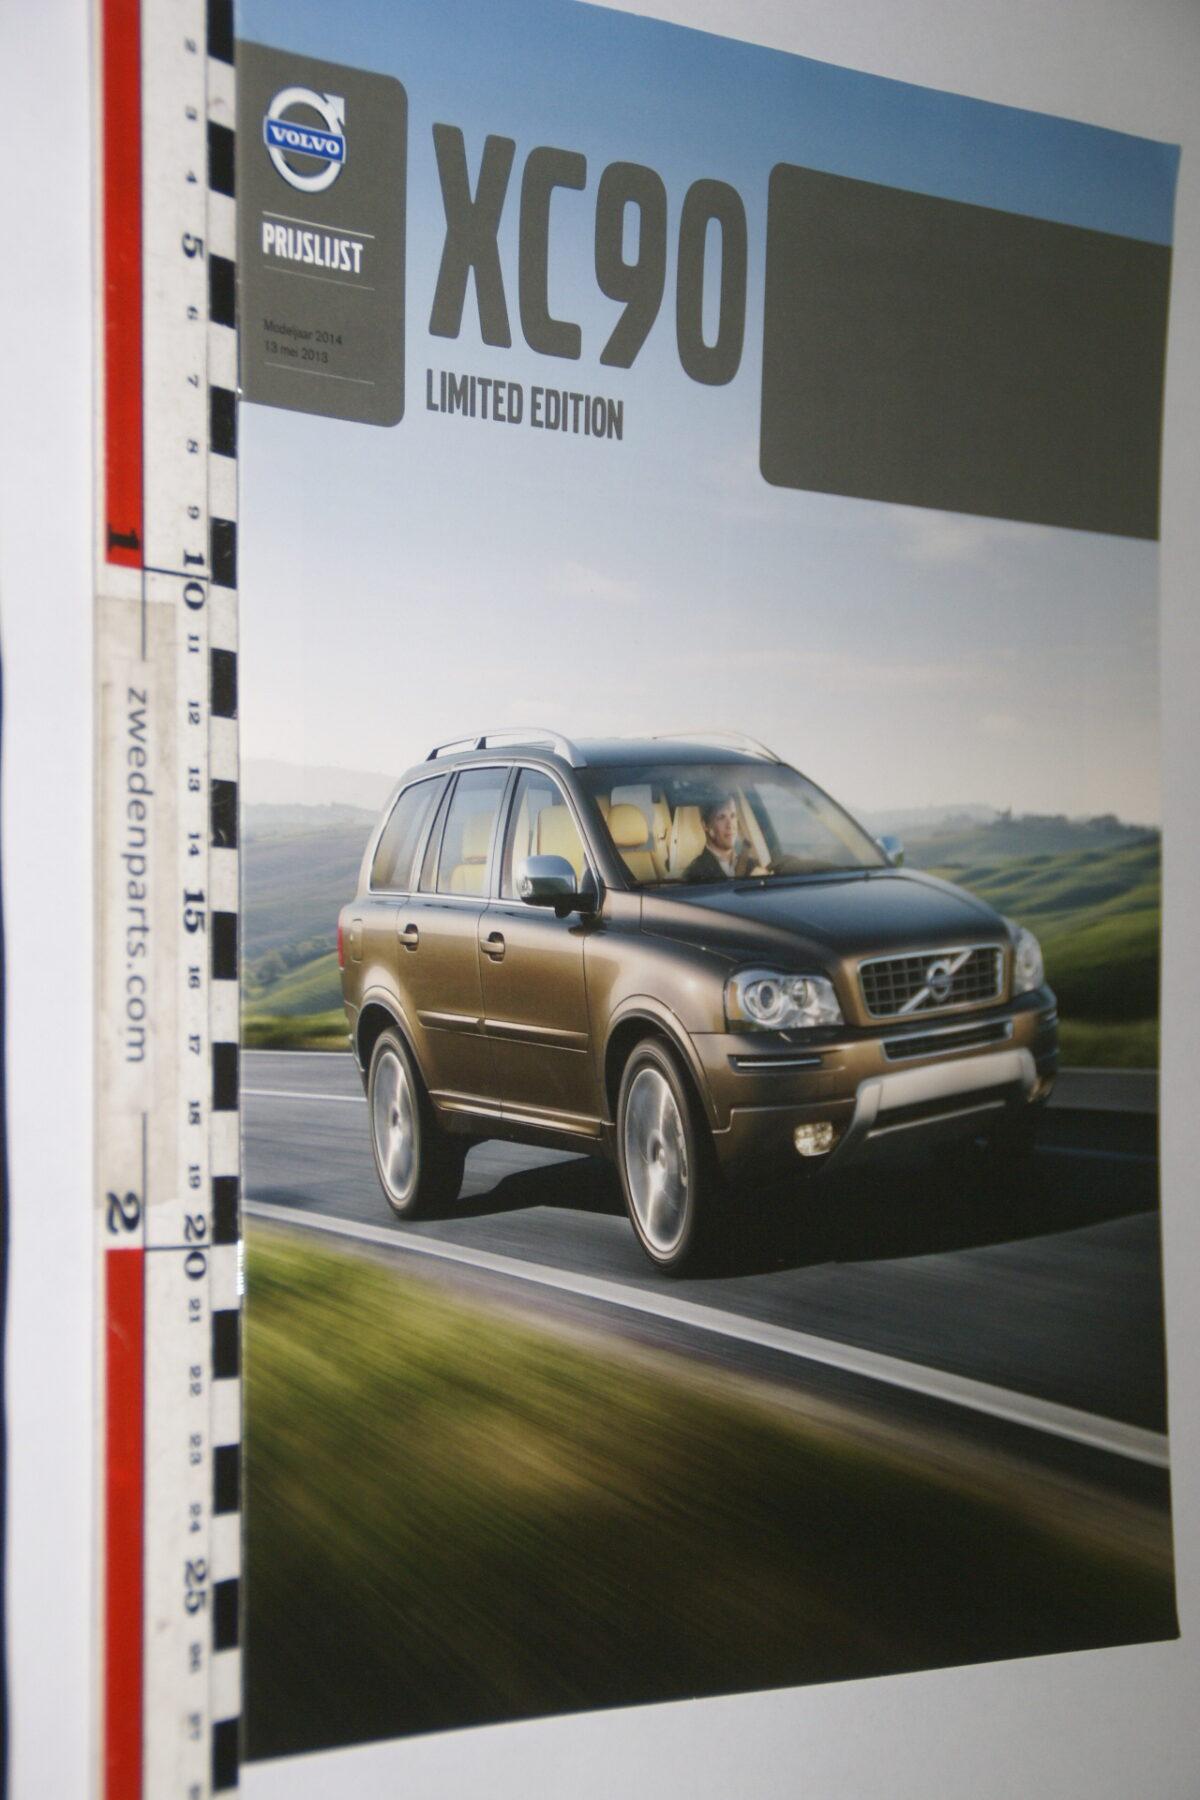 DSC04446 2014 brochure Volvo XC90 nr. MY 14 03-2013-V1-1130dd46